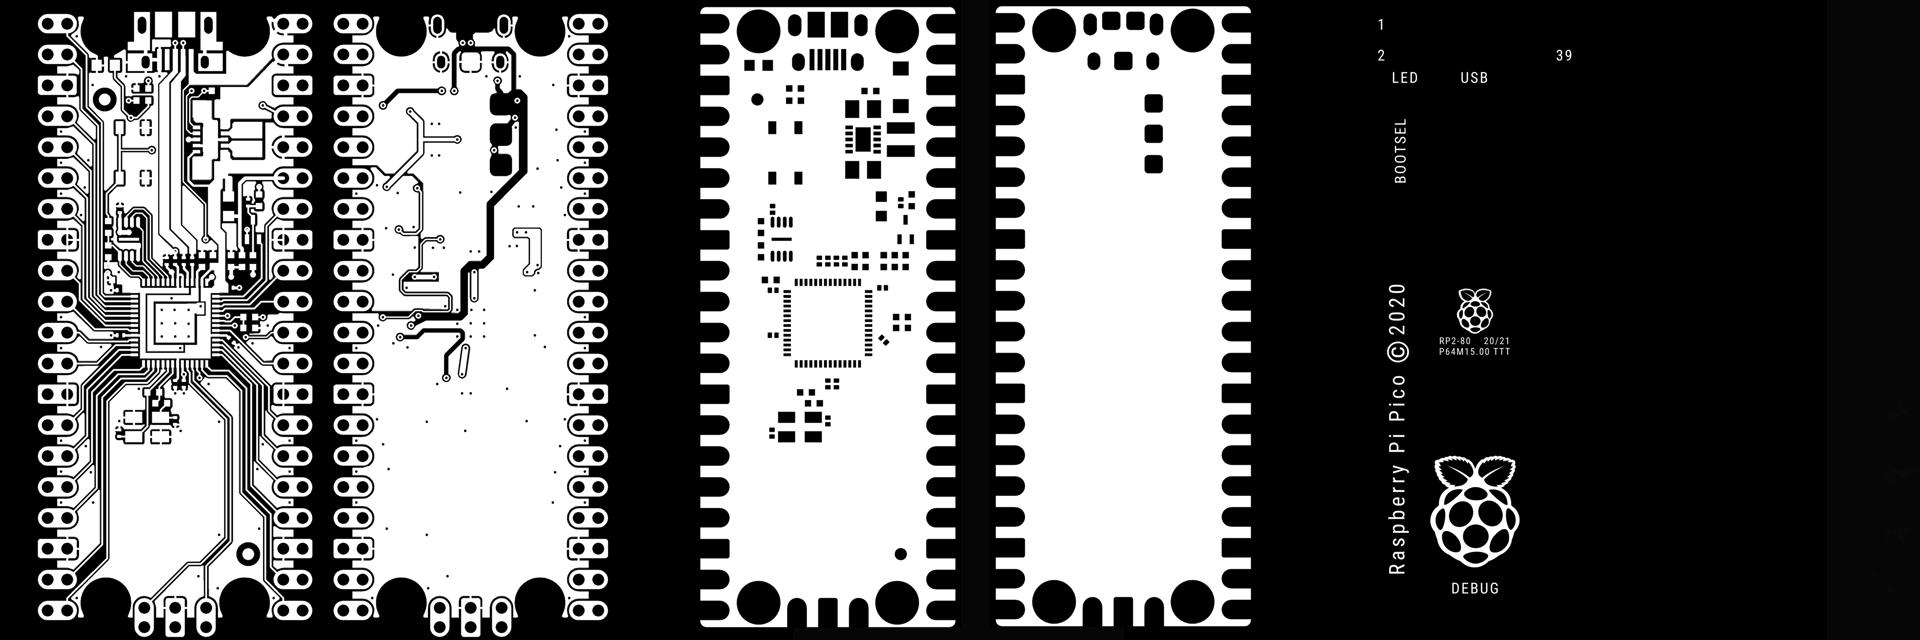 raspberry pi pico schematics